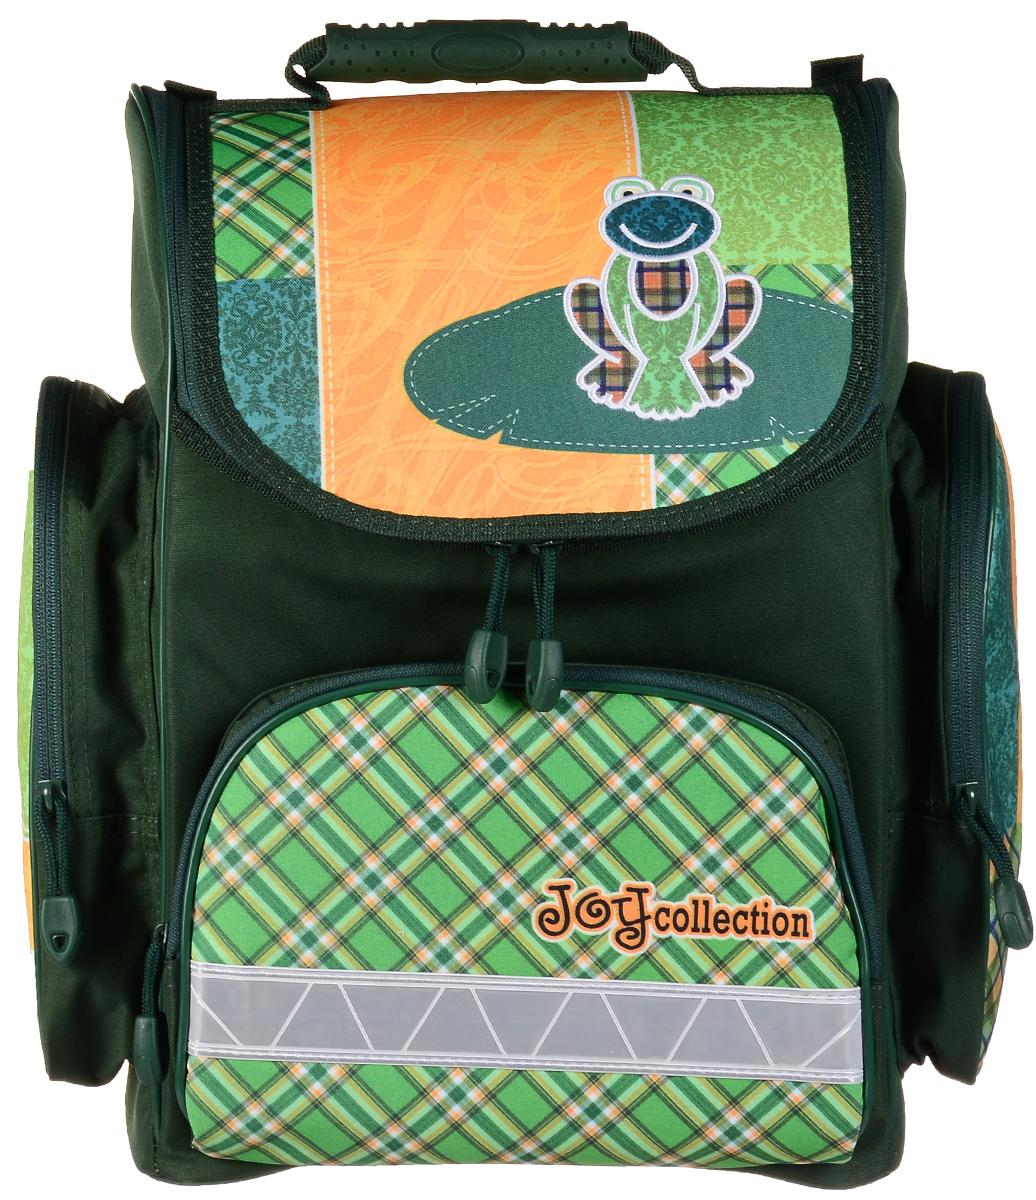 "Tiger Family Ранец школьный ""Joy Collection"", цвет: зеленый, салатовый, желтый, Tiger Enterprise"